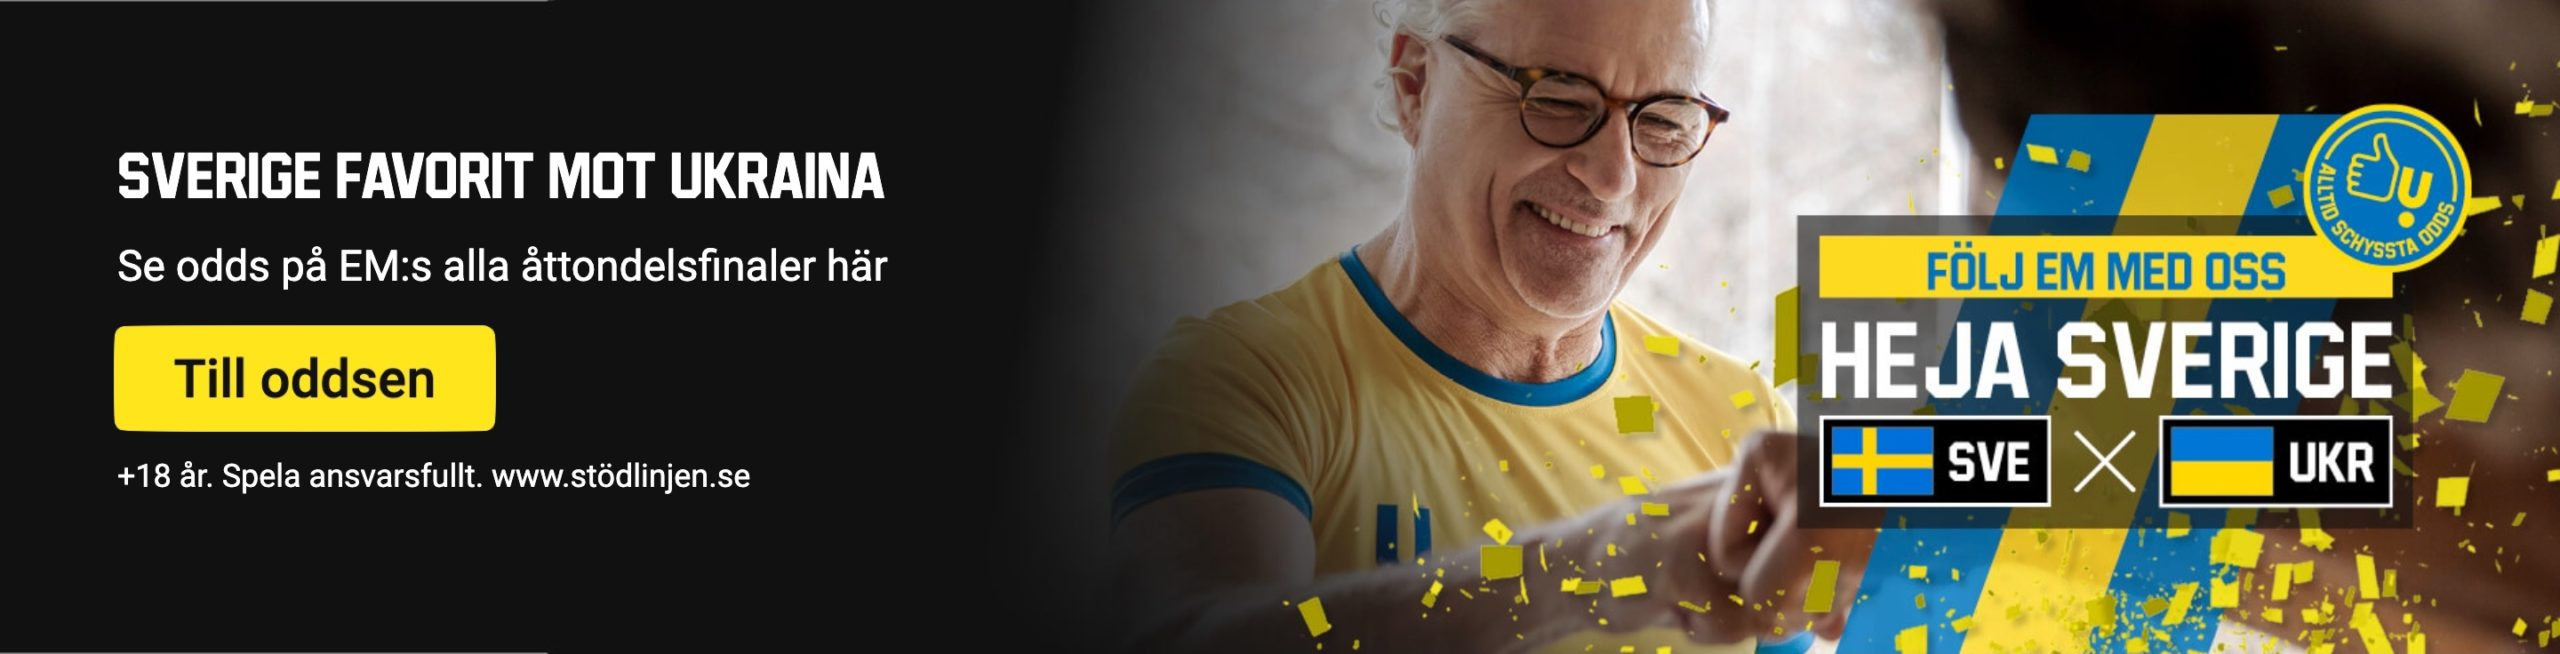 Sverige vs Ukraina EM TV – vilken tid visas Sverige Ukraina på TV?